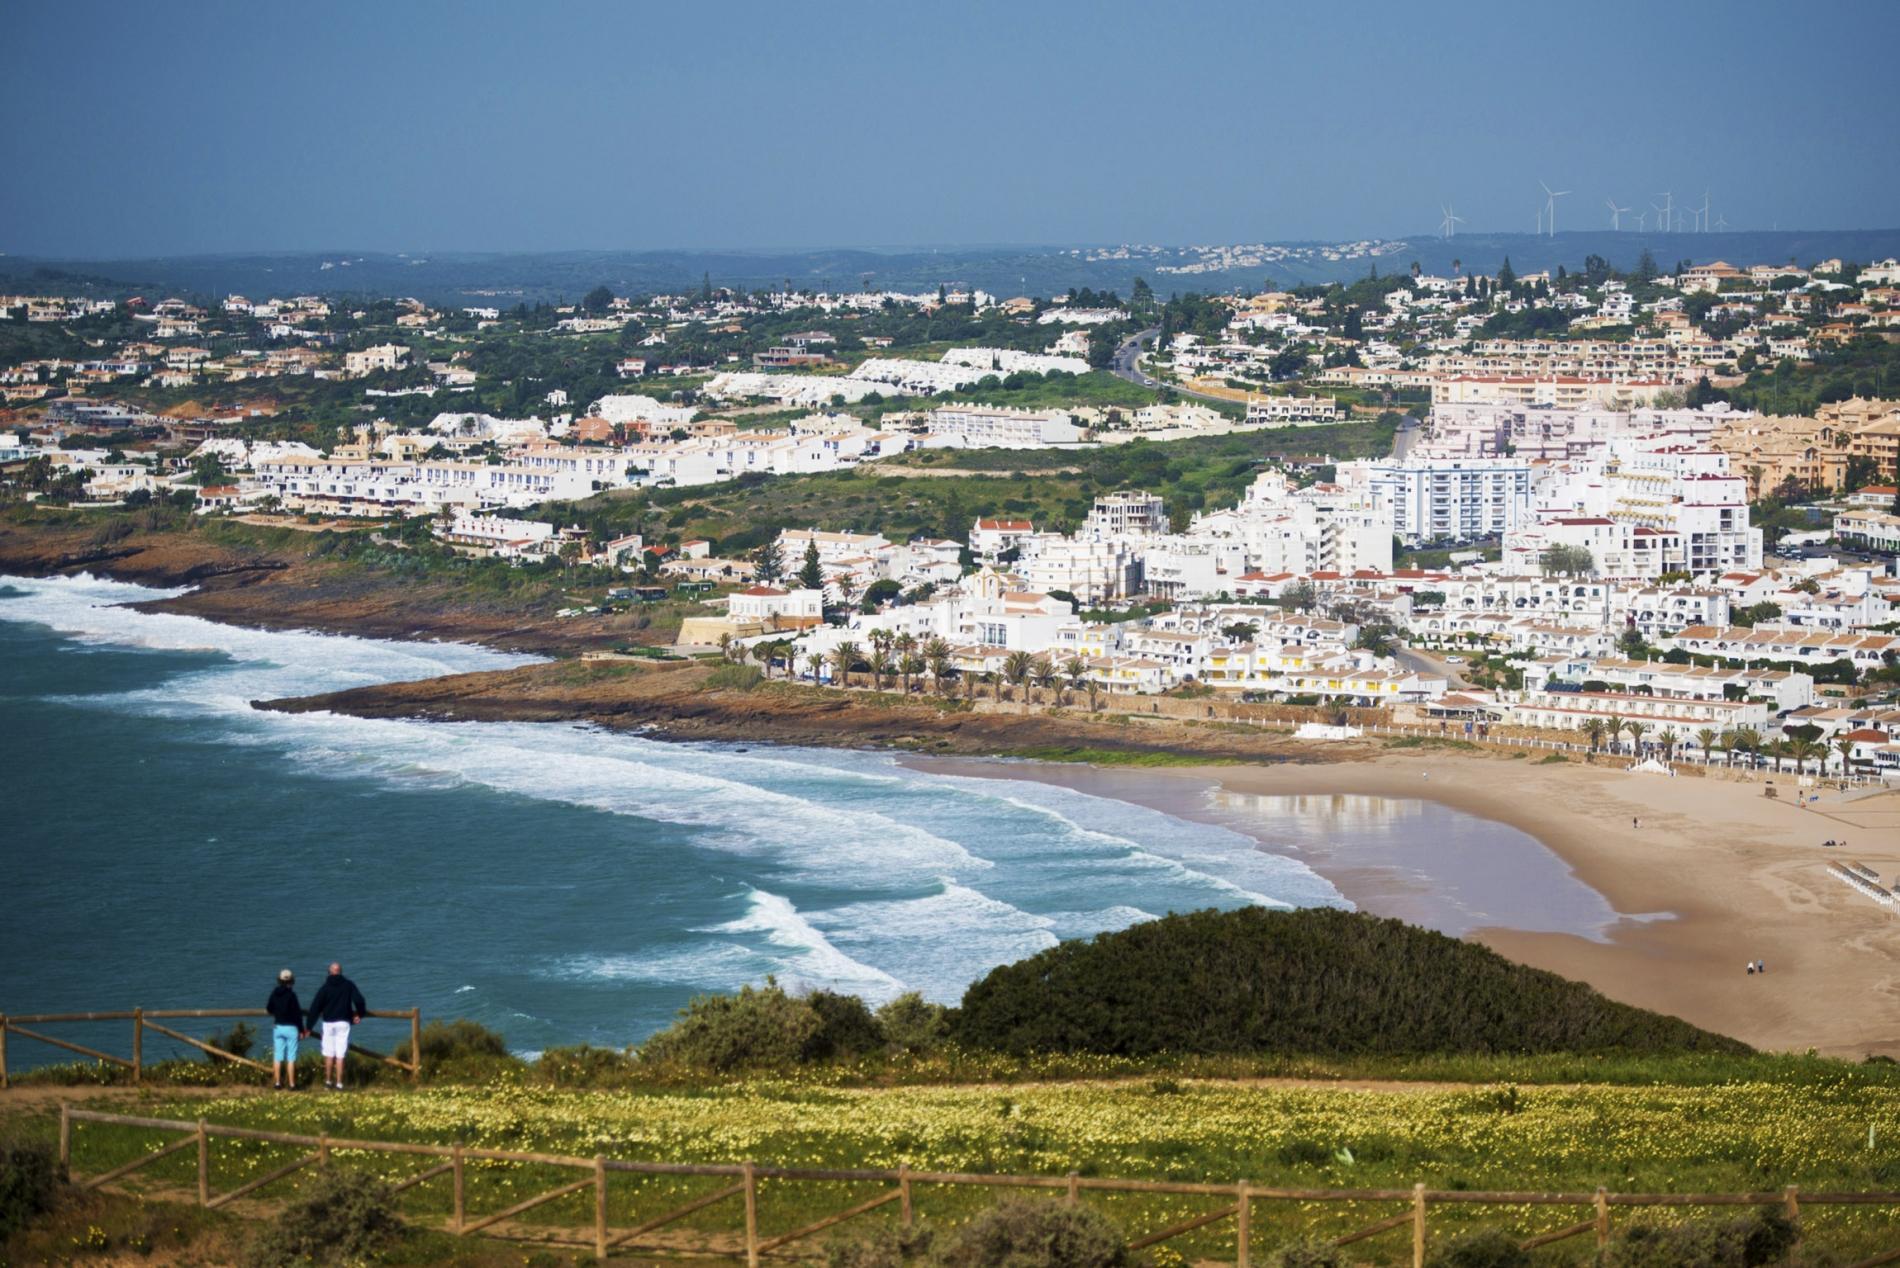 Ferienwohnung B29 - LuzBay Duplex (2558092), Luz, , Algarve, Portugal, Bild 44